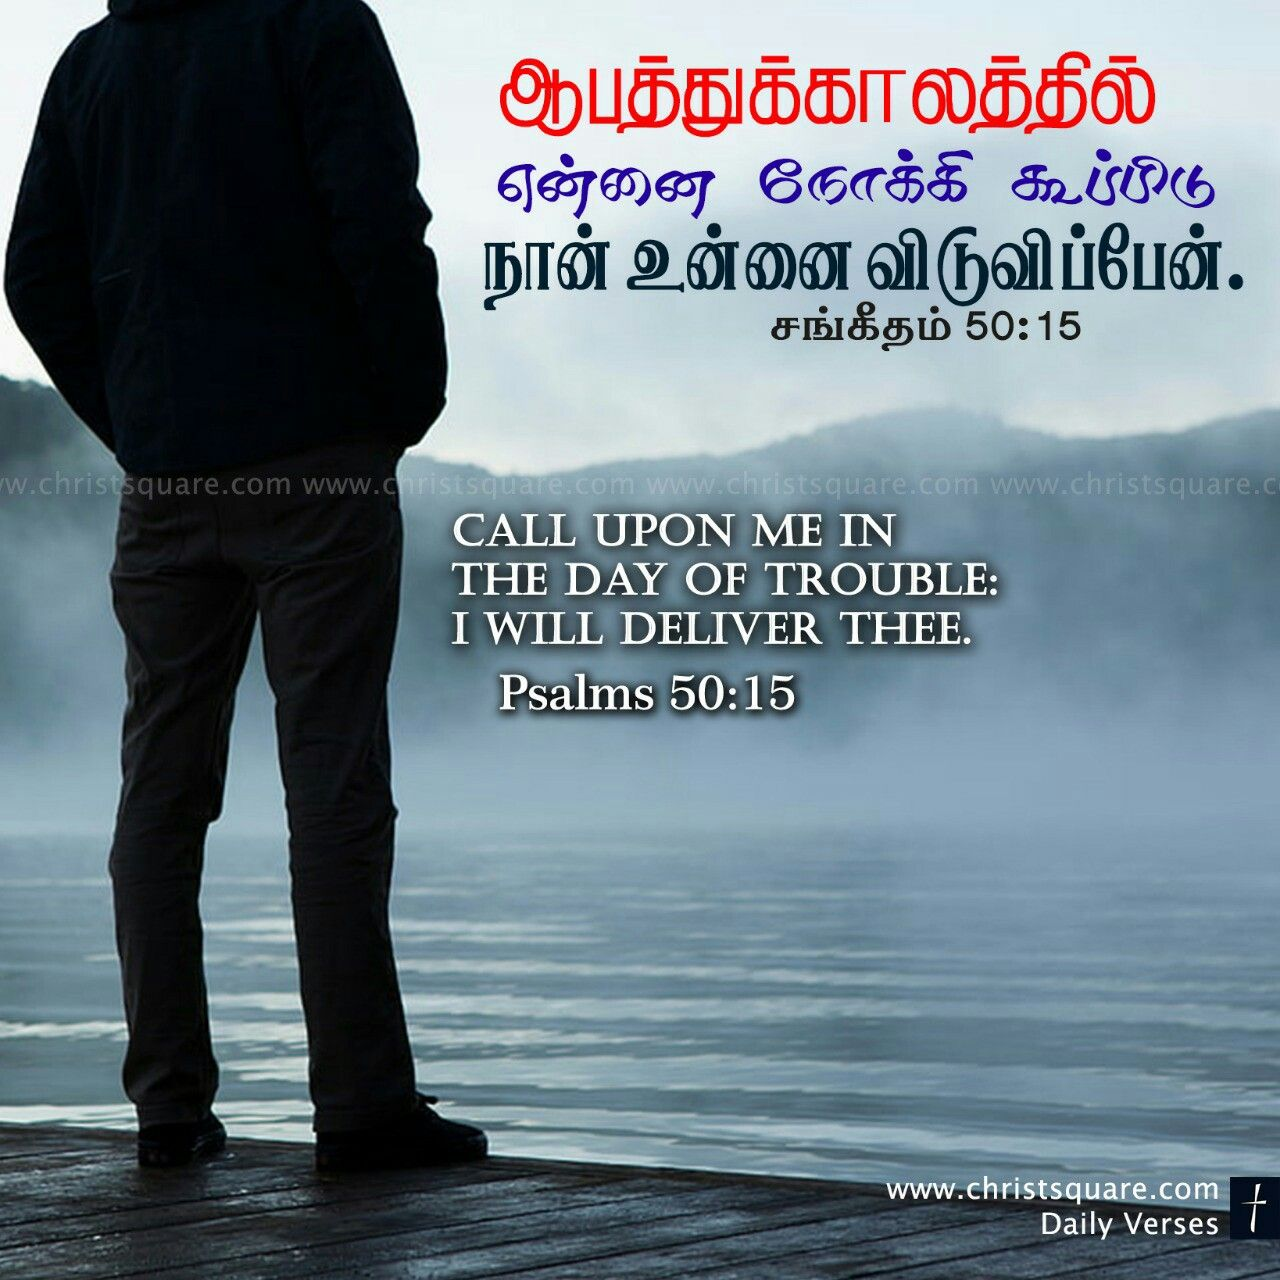 Tamil Christian Whatsapp Status Tamil Christian Wallpaper Tamil